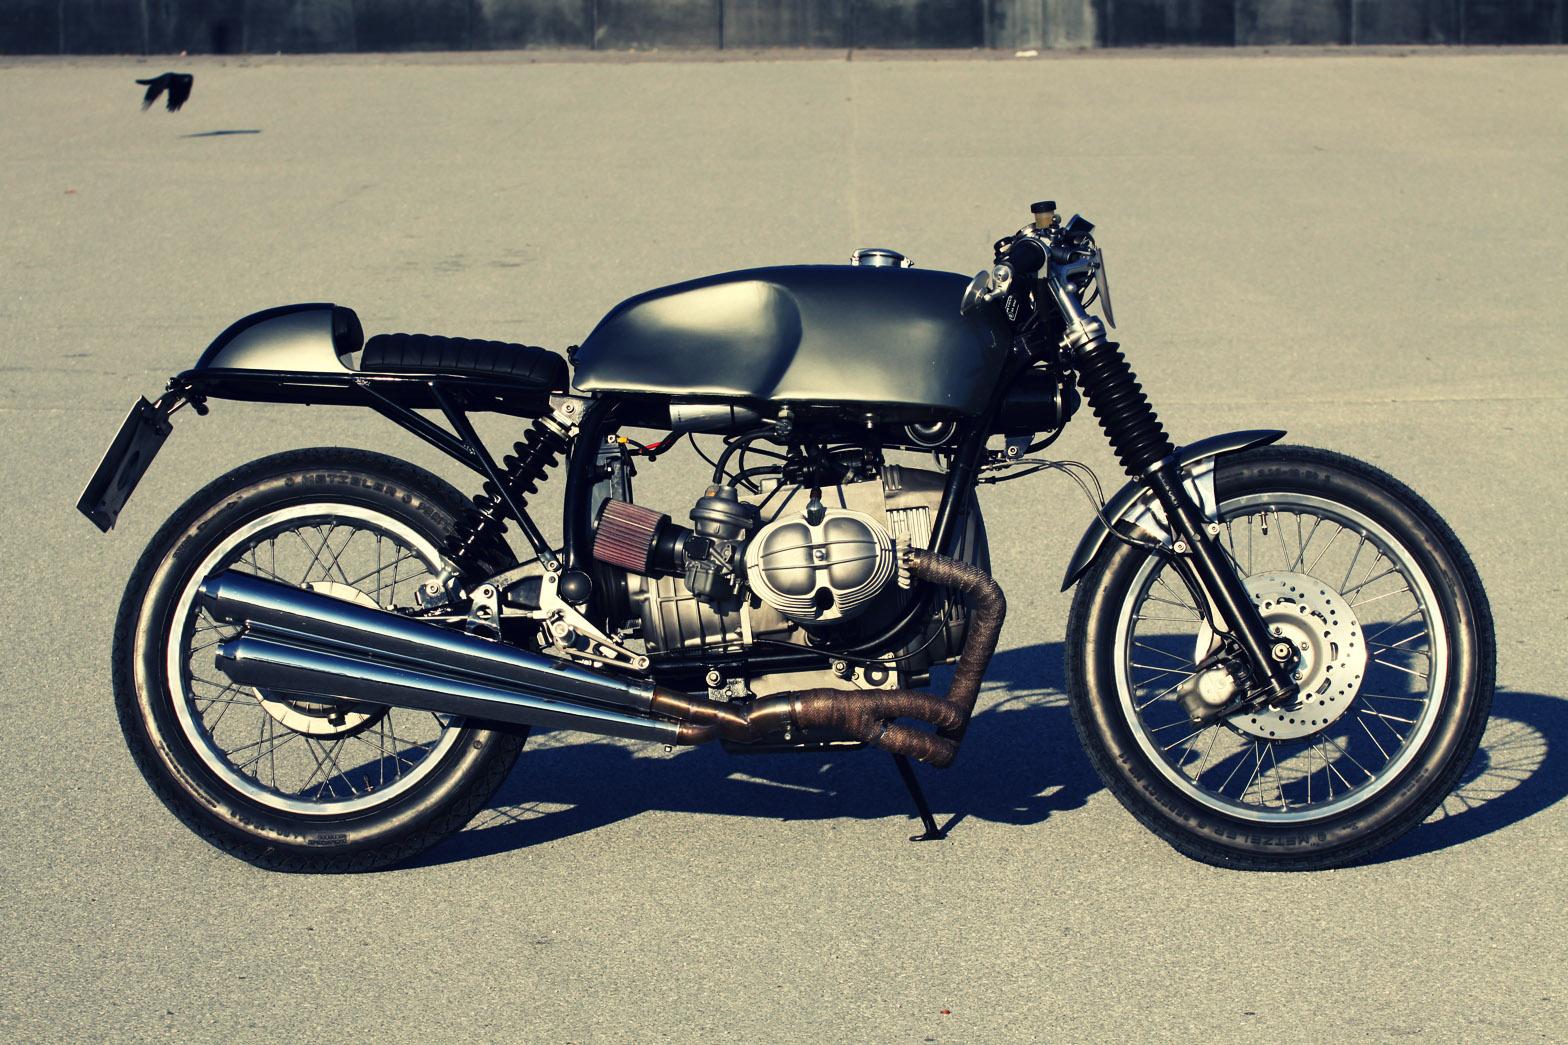 Milchapitas Kustom Bikes Bmw R80g S 1983 By Urban Motors